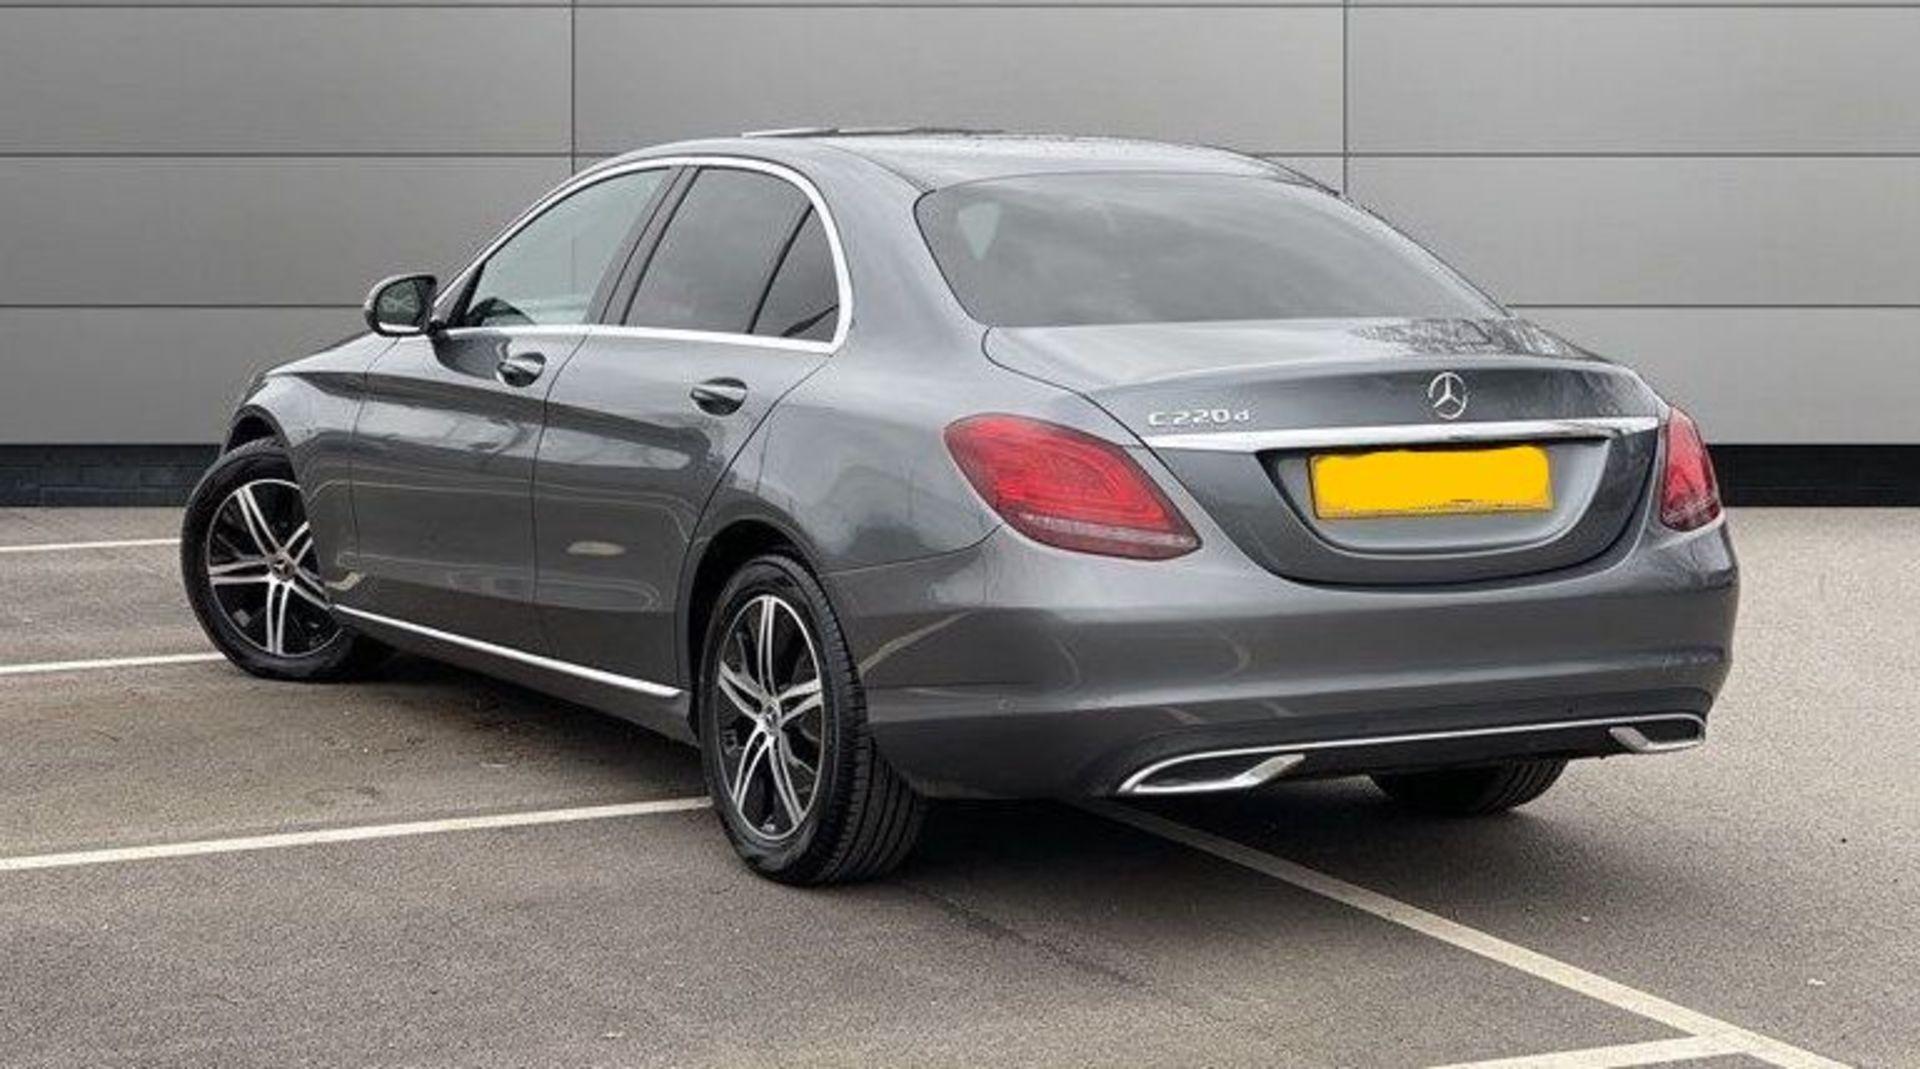 (Reserve Met) Mercedes C220d Sport - 9G Tronic Auto - 188BHP - 2019 Reg - Reversing Cam - Sat Nav - - Image 2 of 7